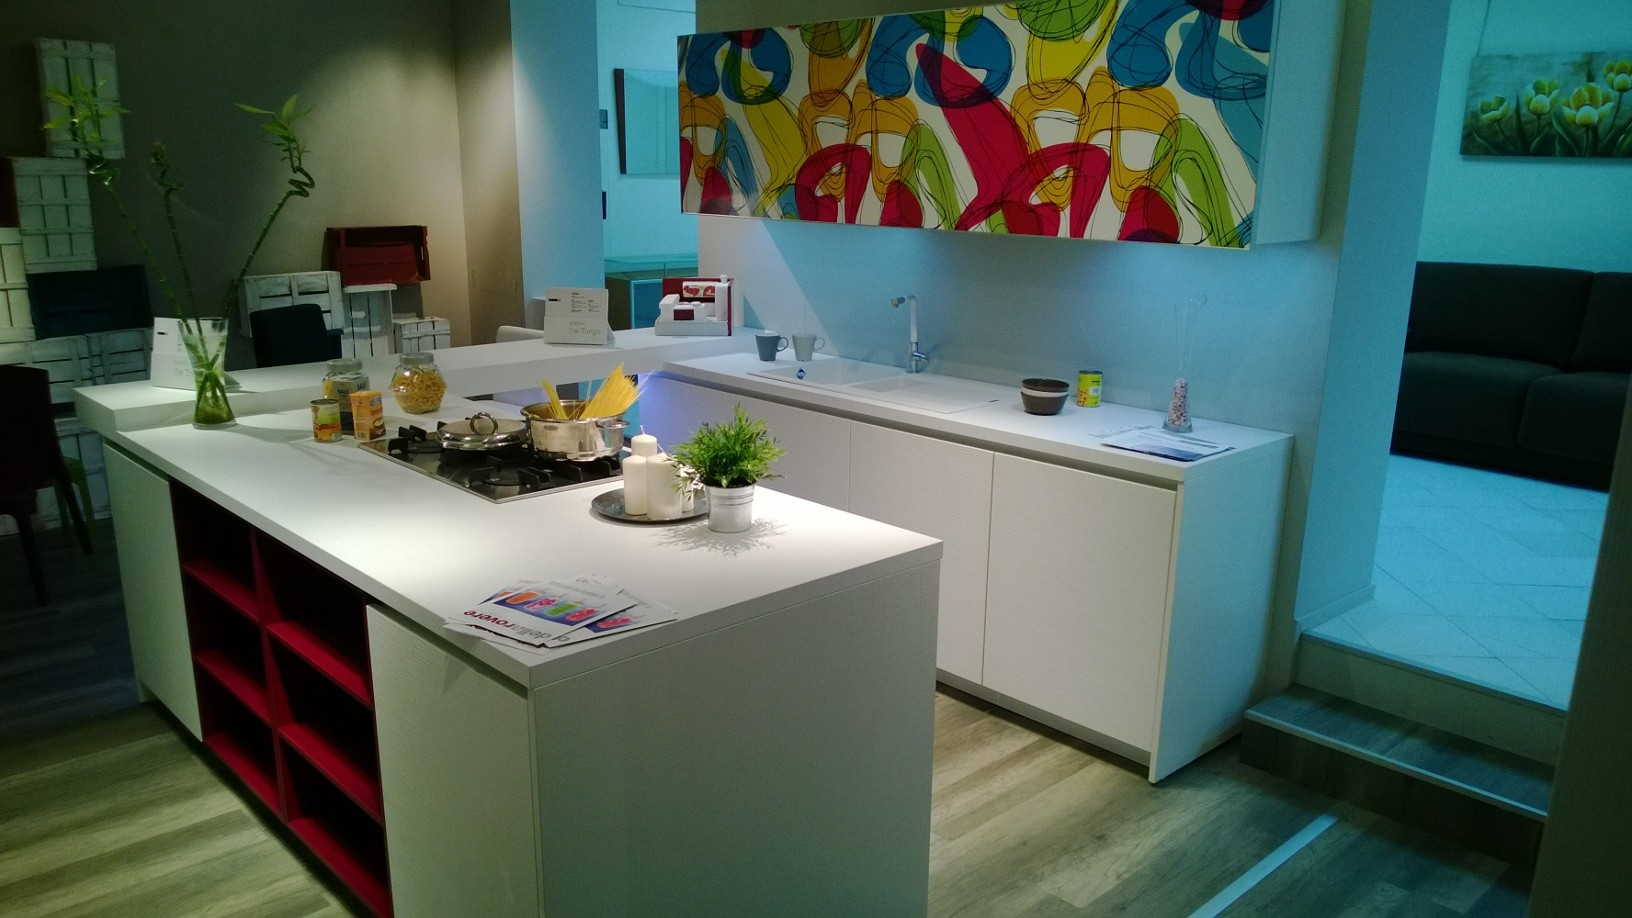 Emejing Cucine Del Tongo Prezzi Gallery - bakeroffroad.us ...